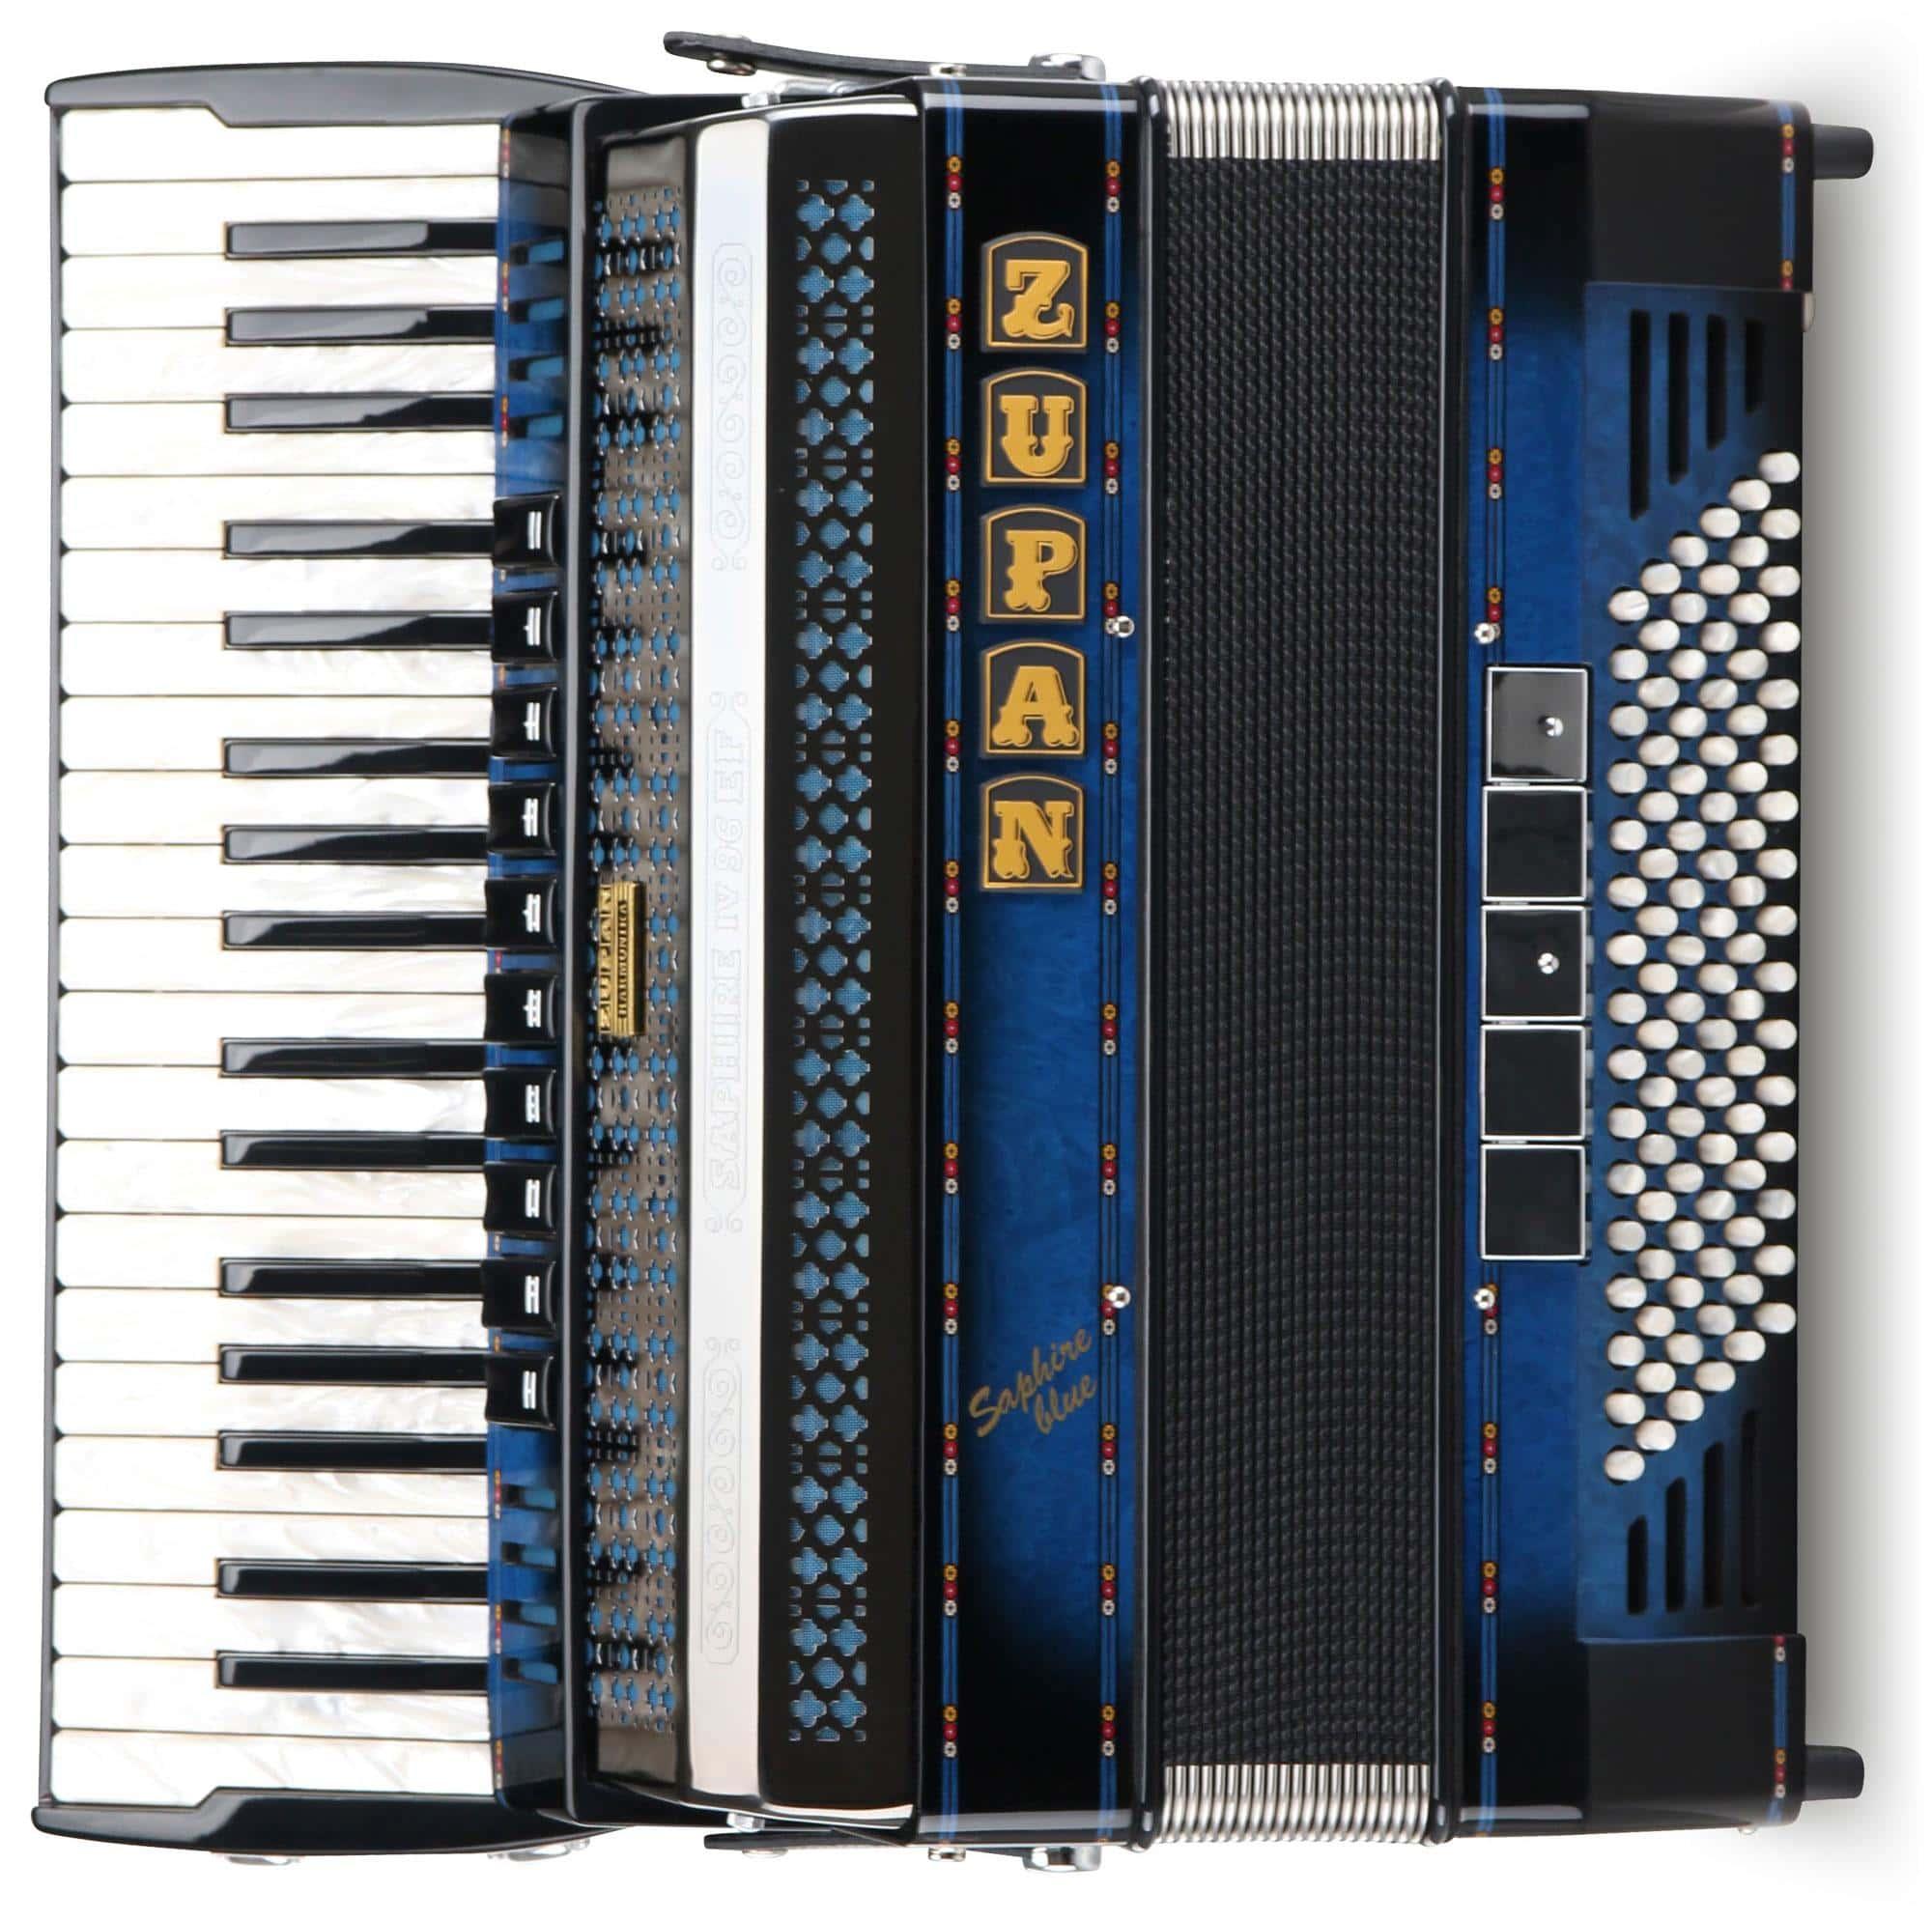 Akkordeons - Zupan Saphire IV 96 EF|MHR Akkordeon Shadow Blue - Onlineshop Musikhaus Kirstein